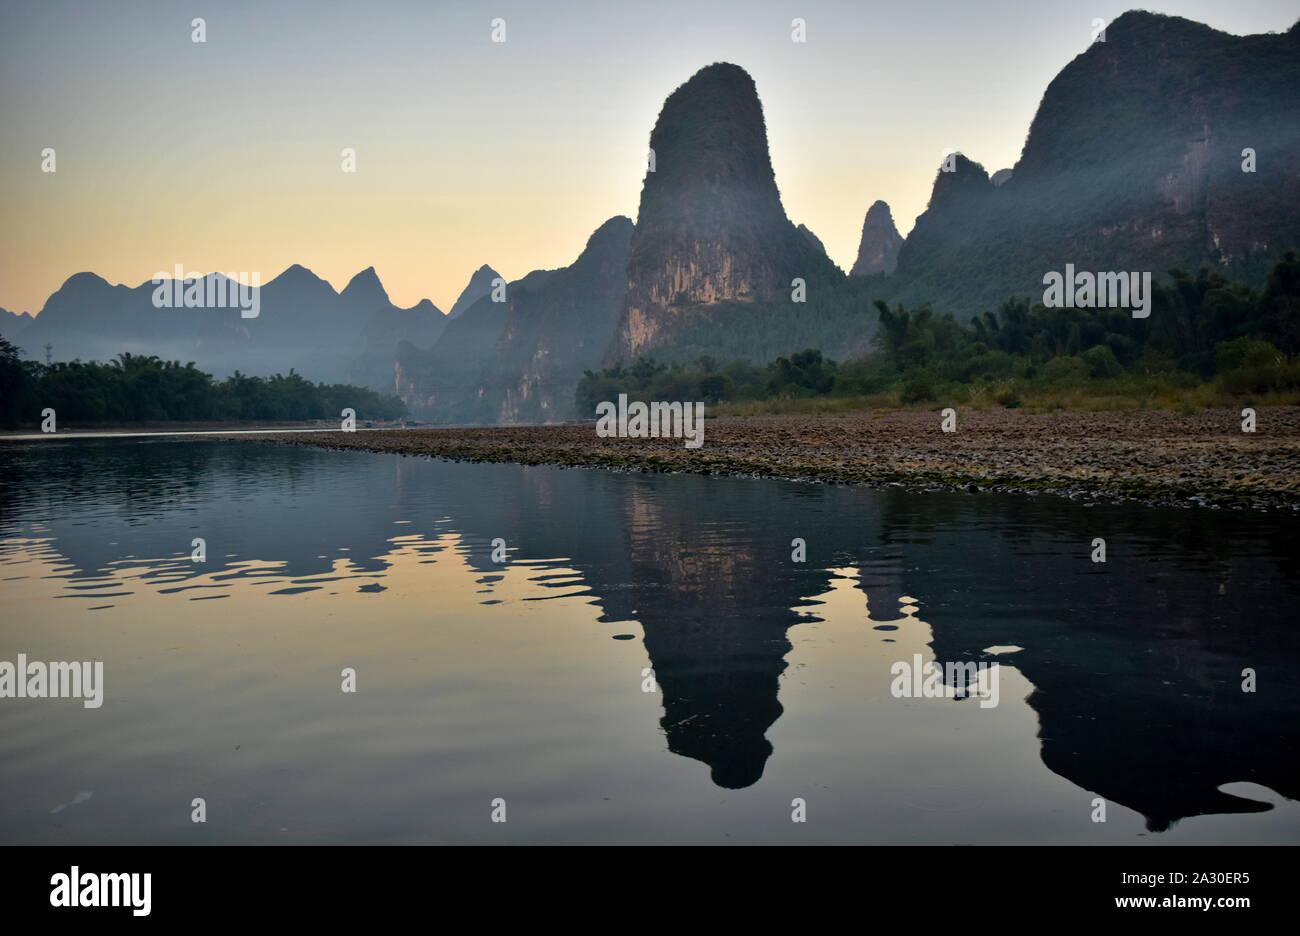 Li river basin and mountains at dusk, Guangxi, China Stock Photo